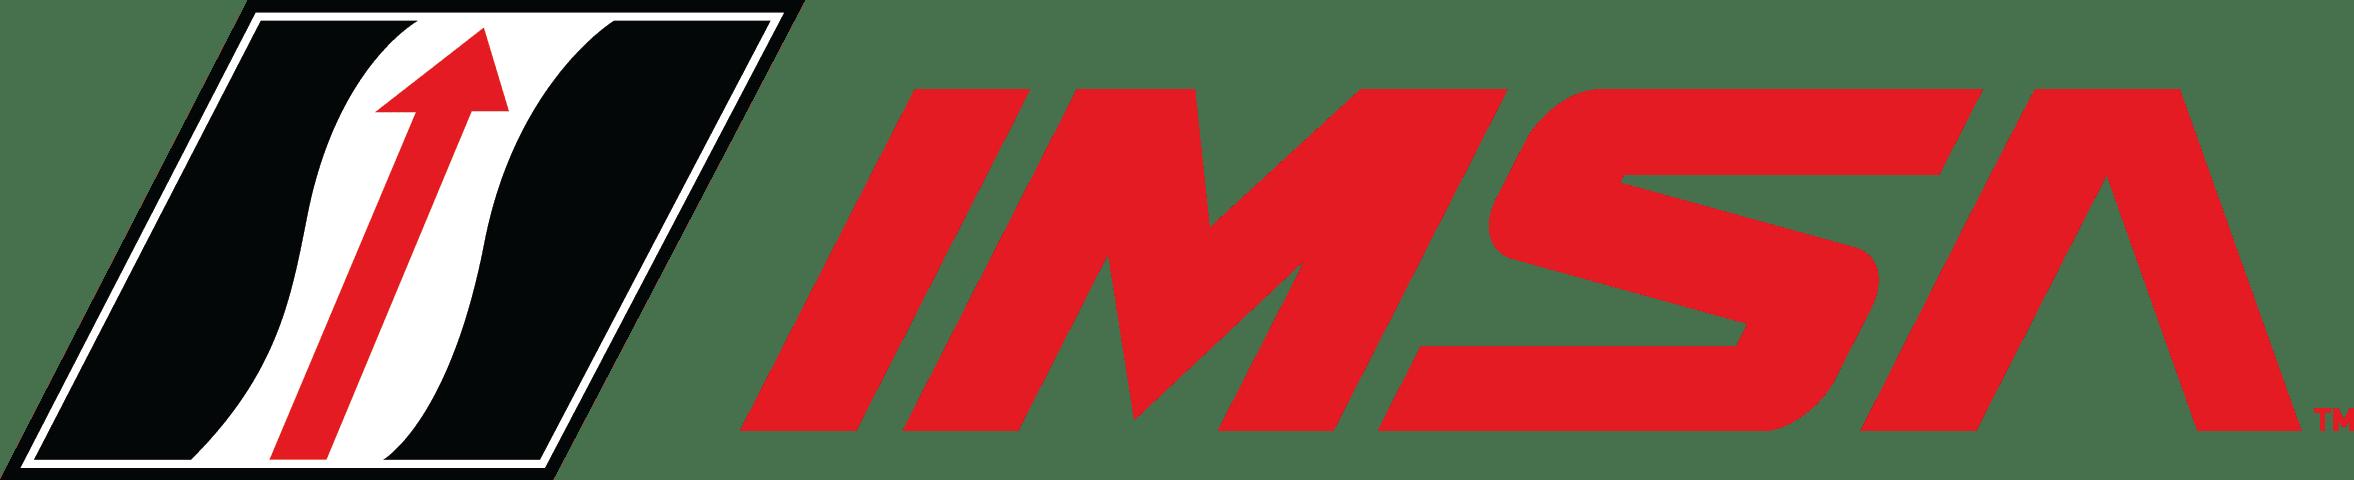 Porsche Sprint IMSA logo